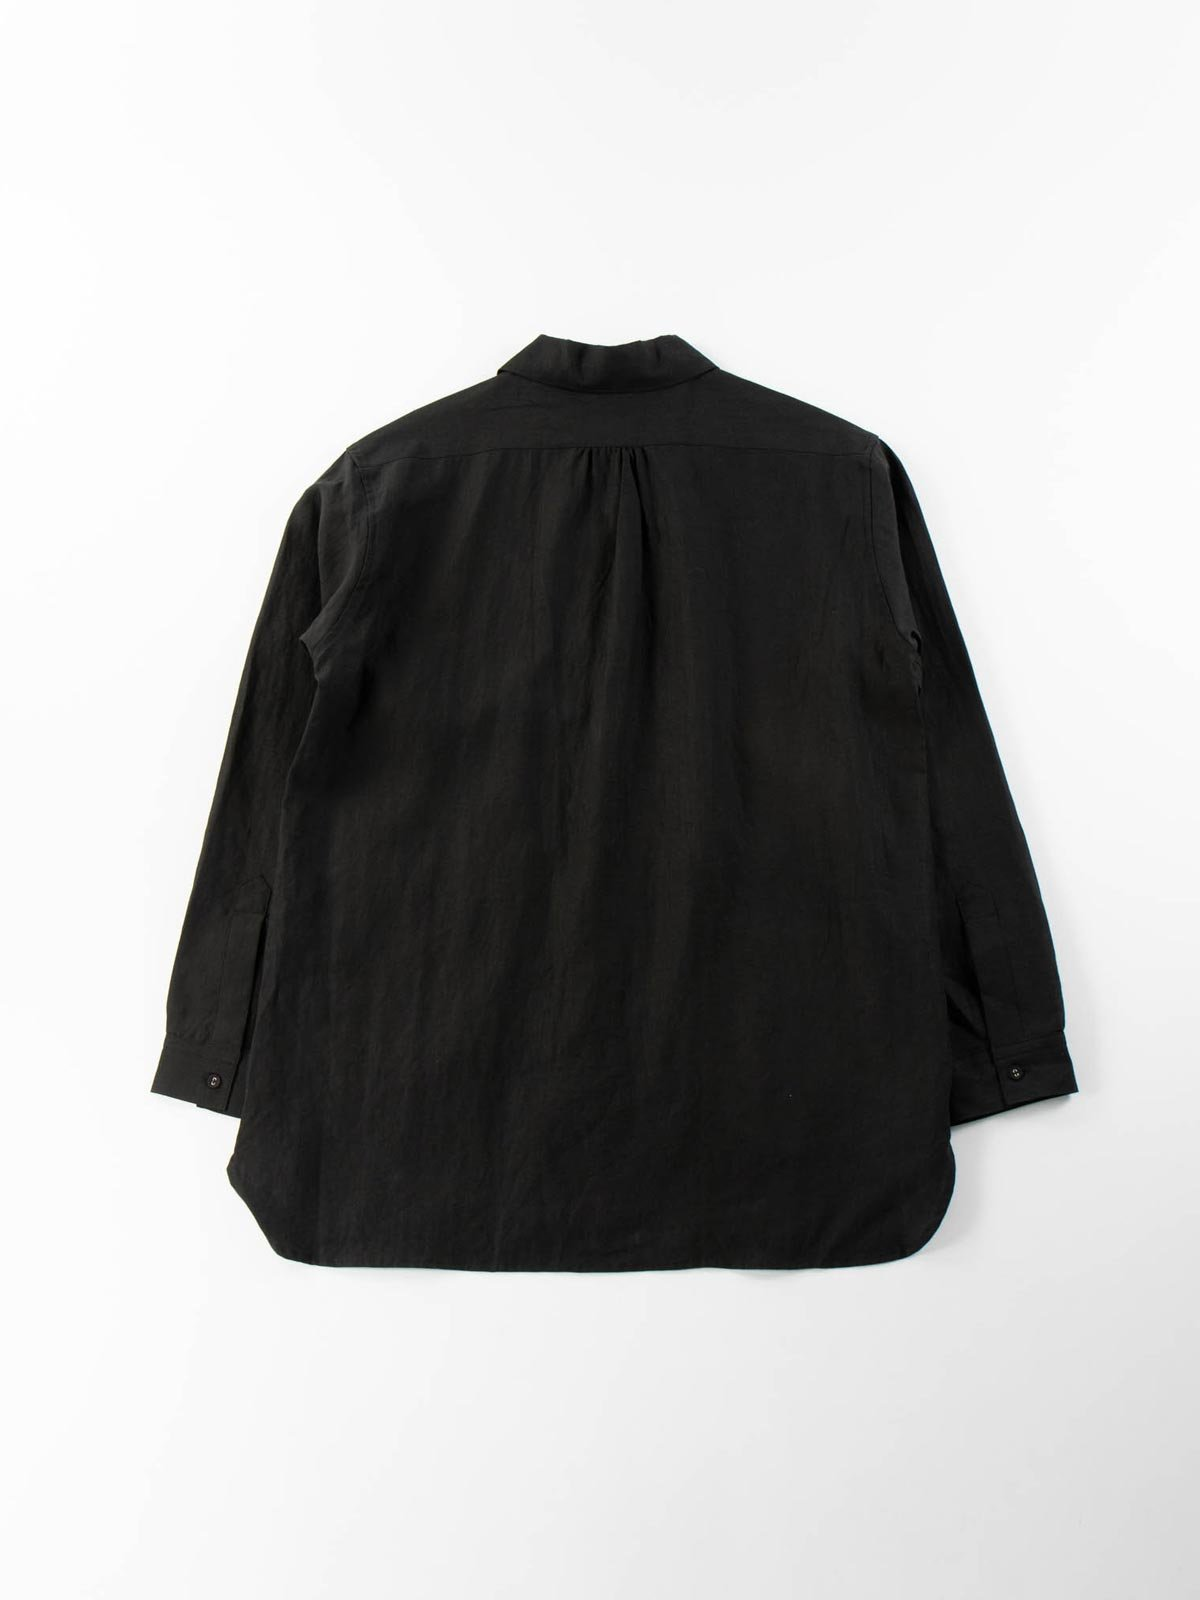 LINEN GARDNER SHIRT BLACK - Image 6